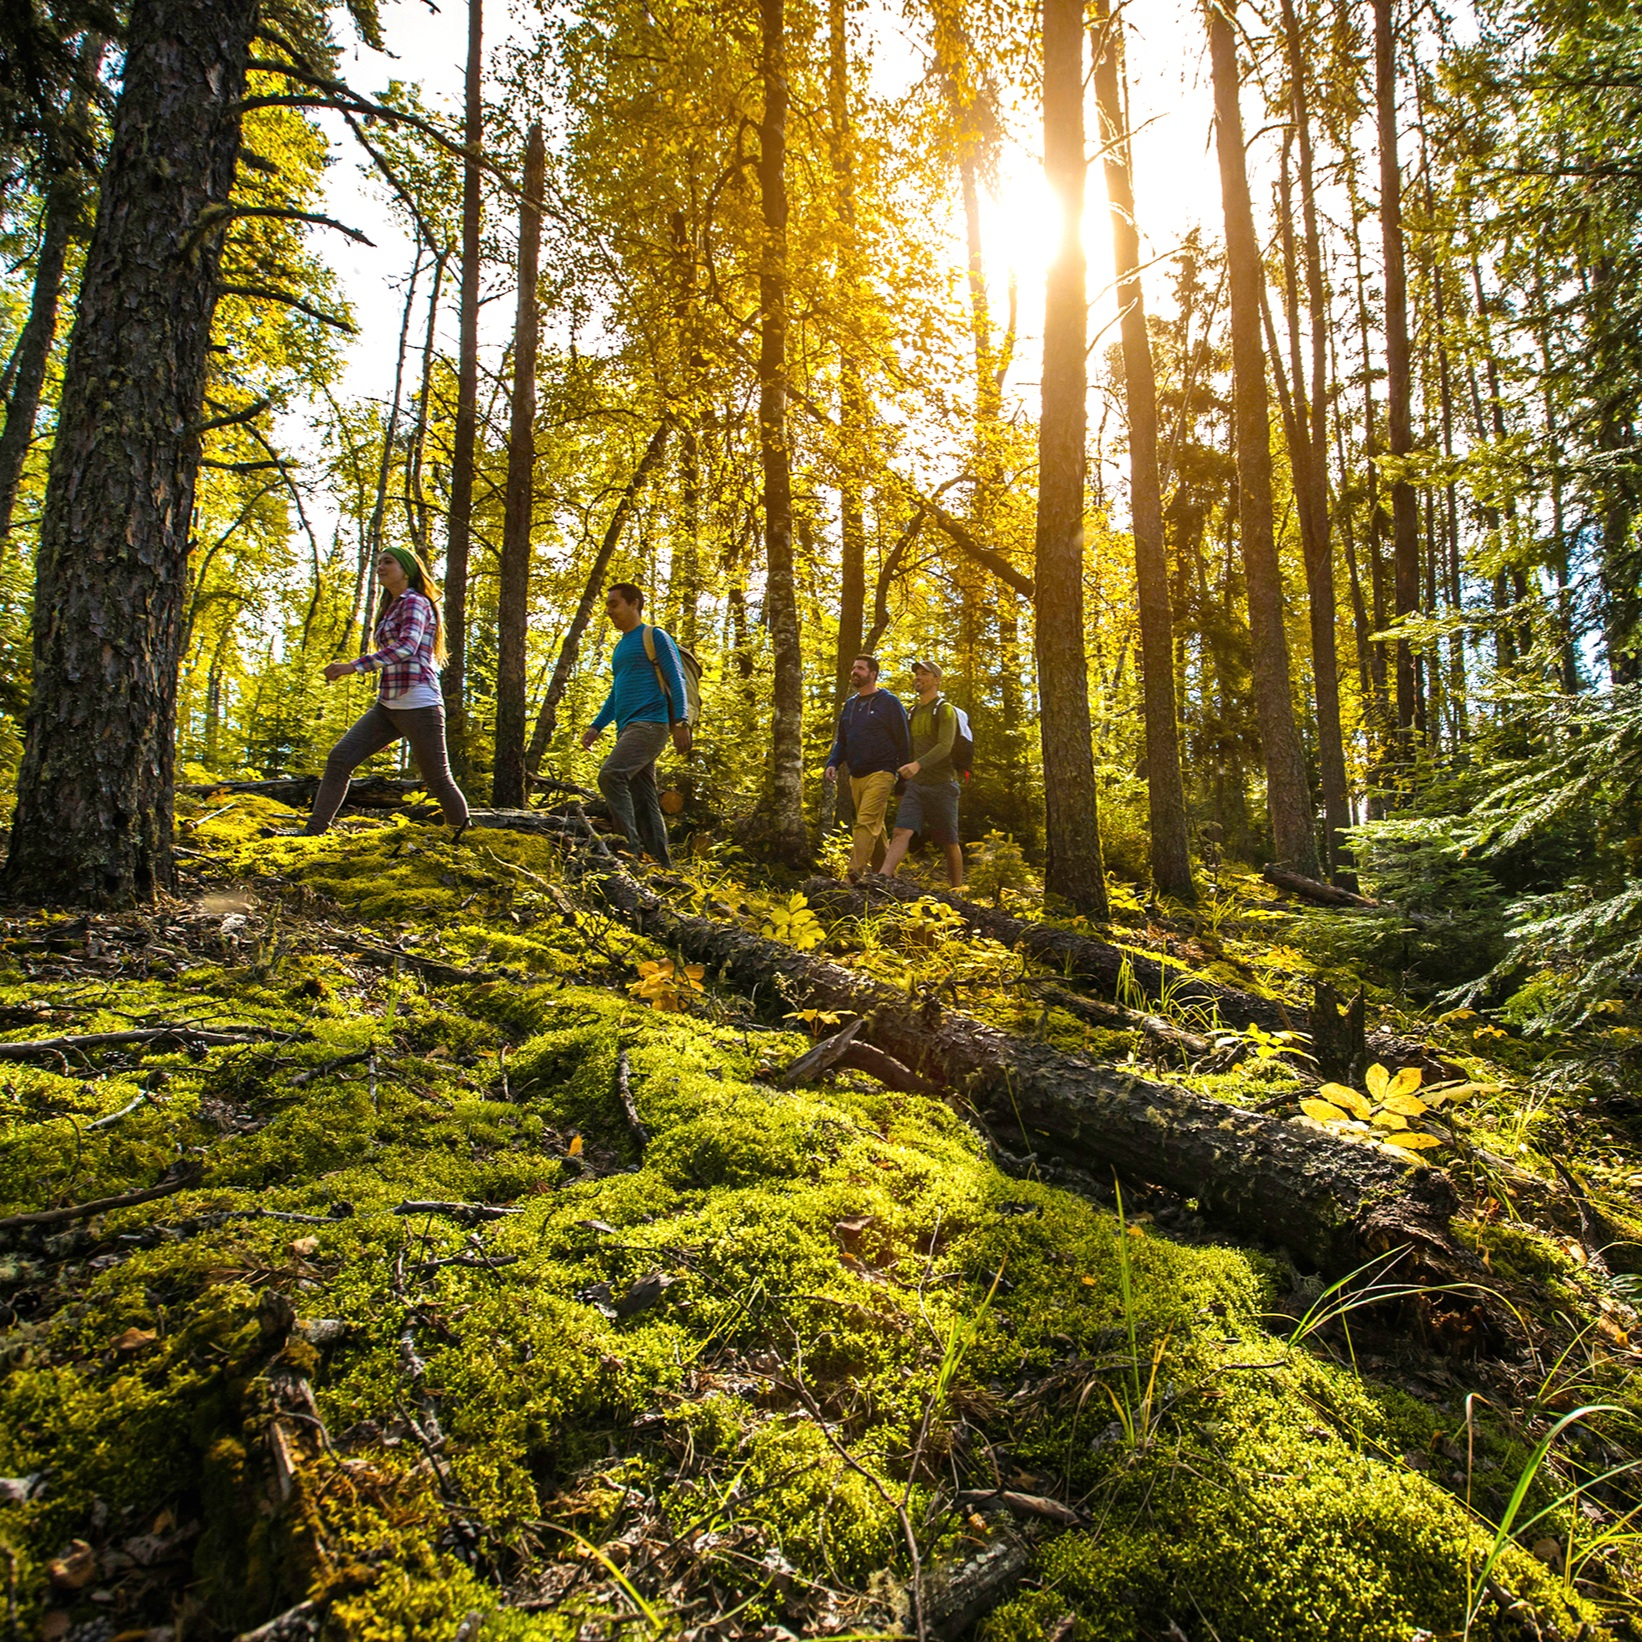 Prince+Albert+National+Park+Hiking+Forest+Experience+Saskatchewan.jpg